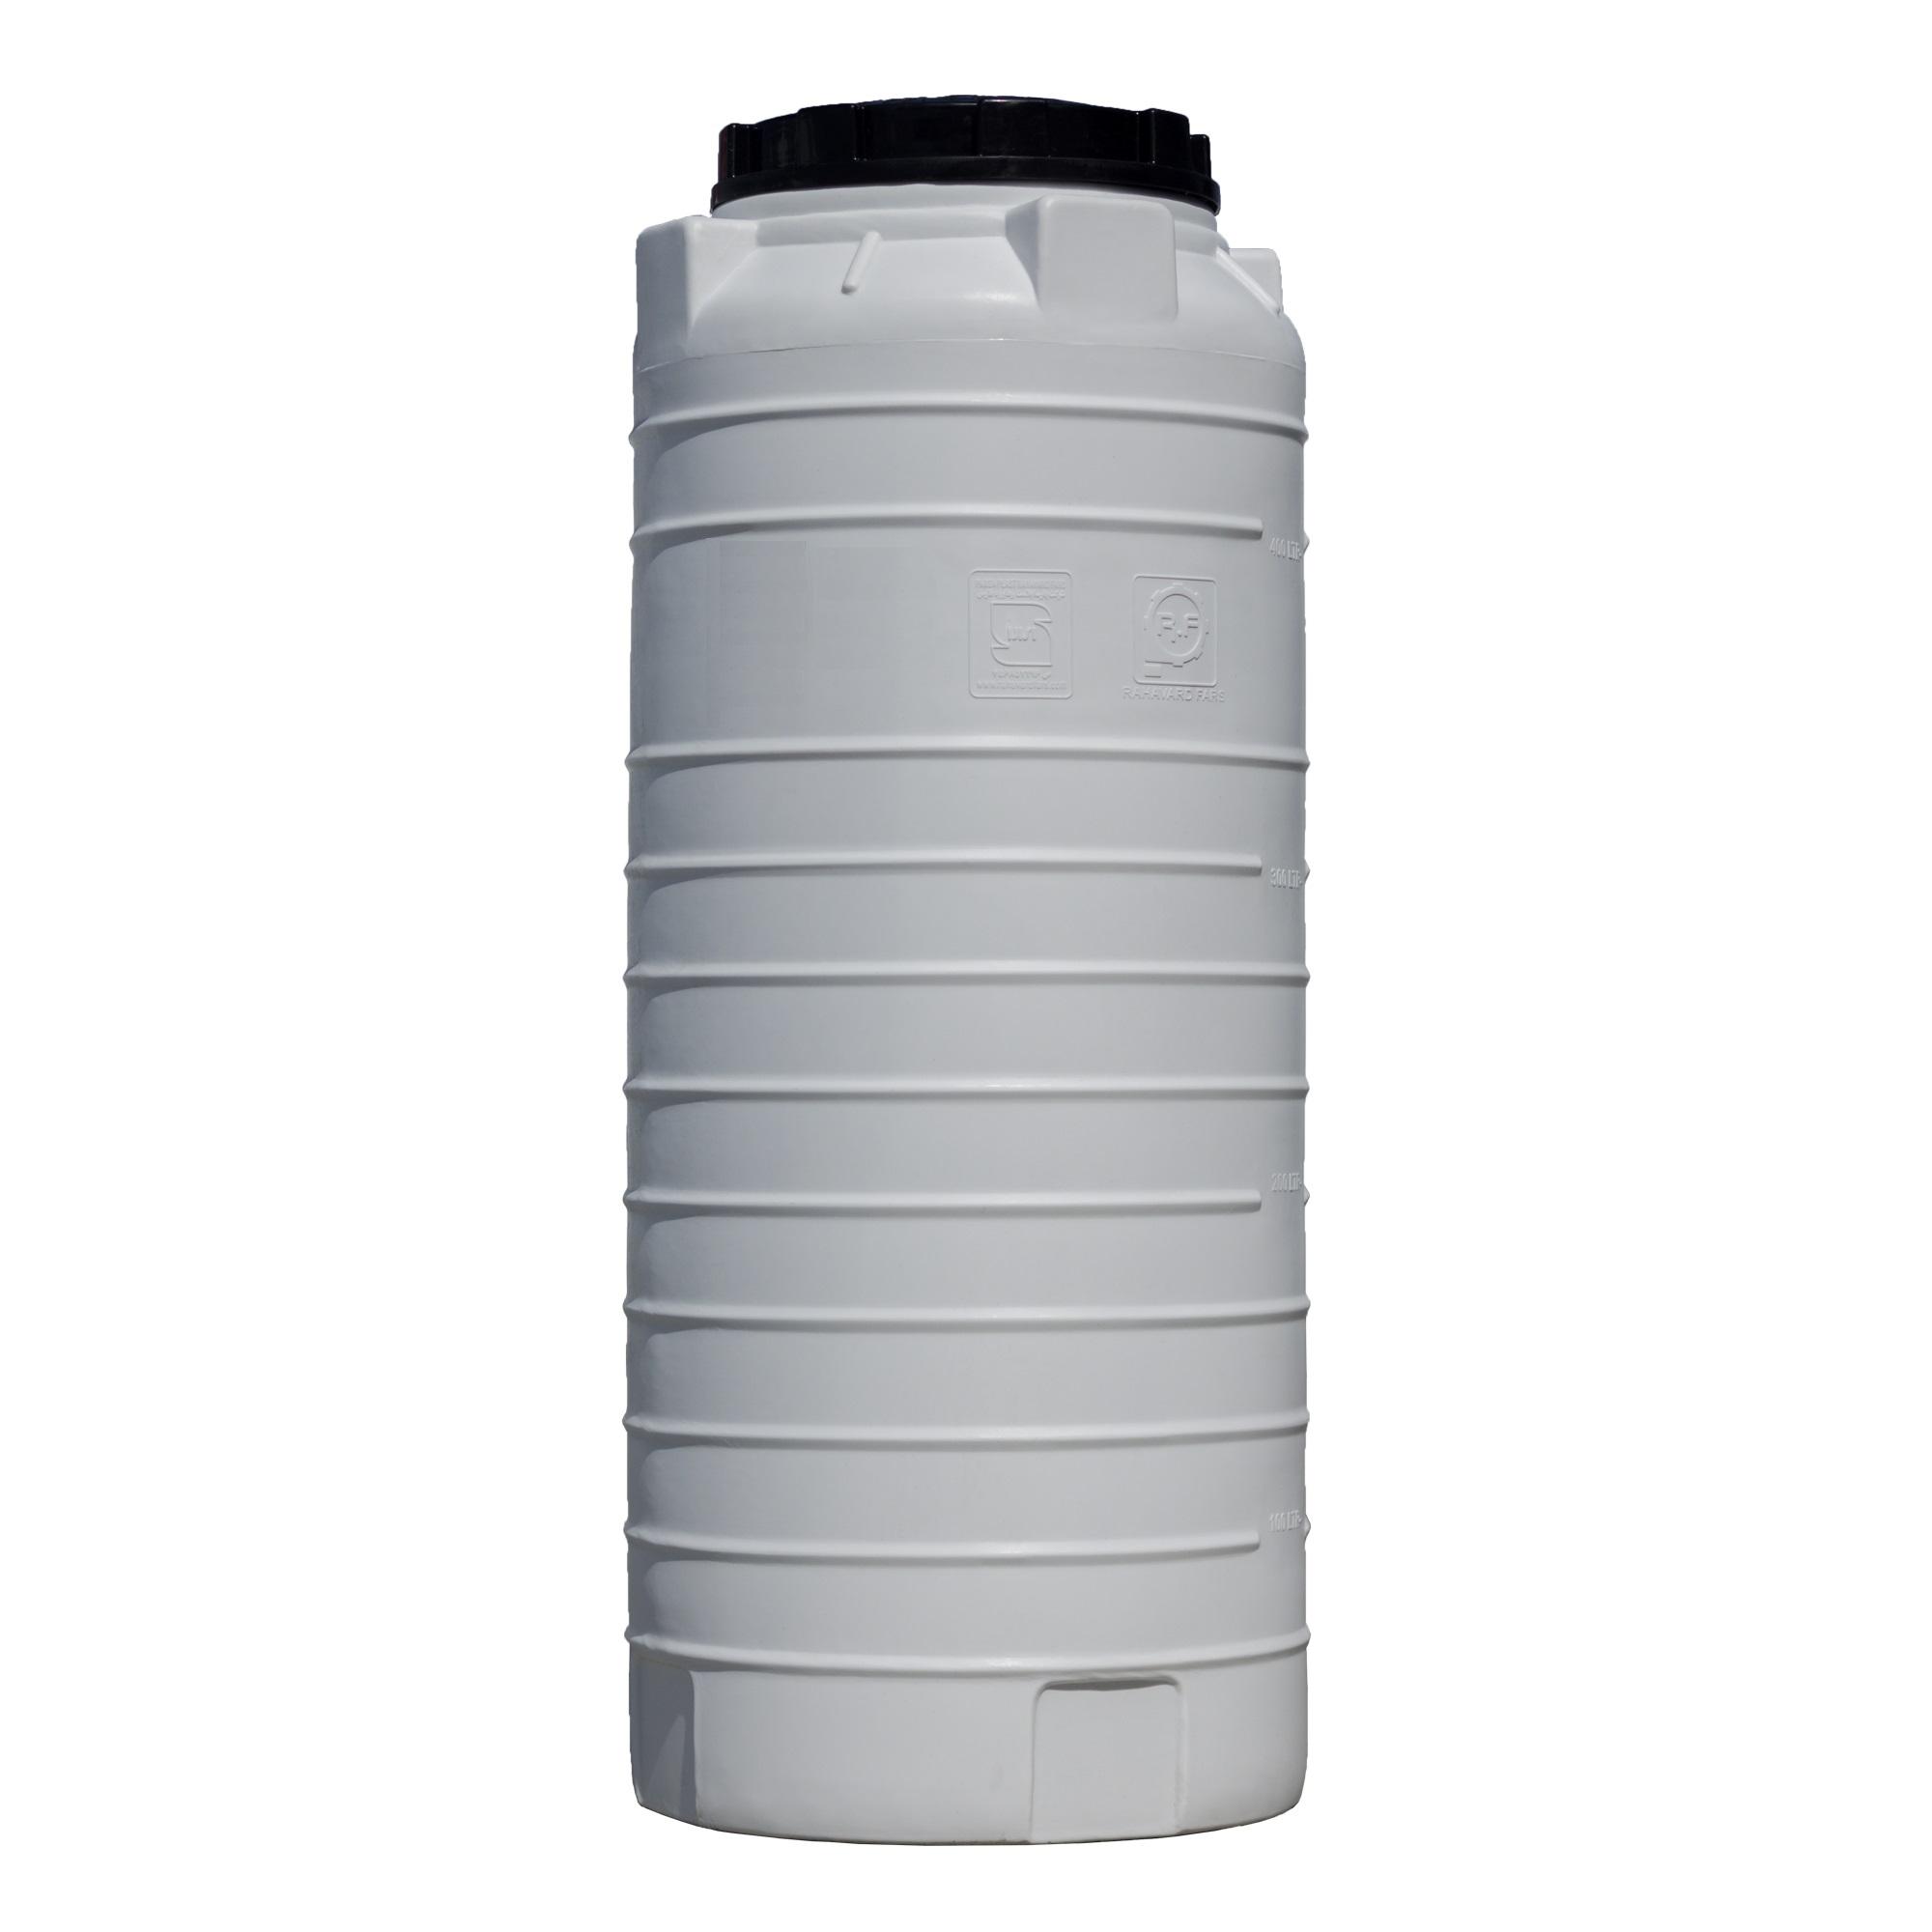 قیمت                                      مخزن آب رهاورد فارس کد 4868 حجم 500 لیتر